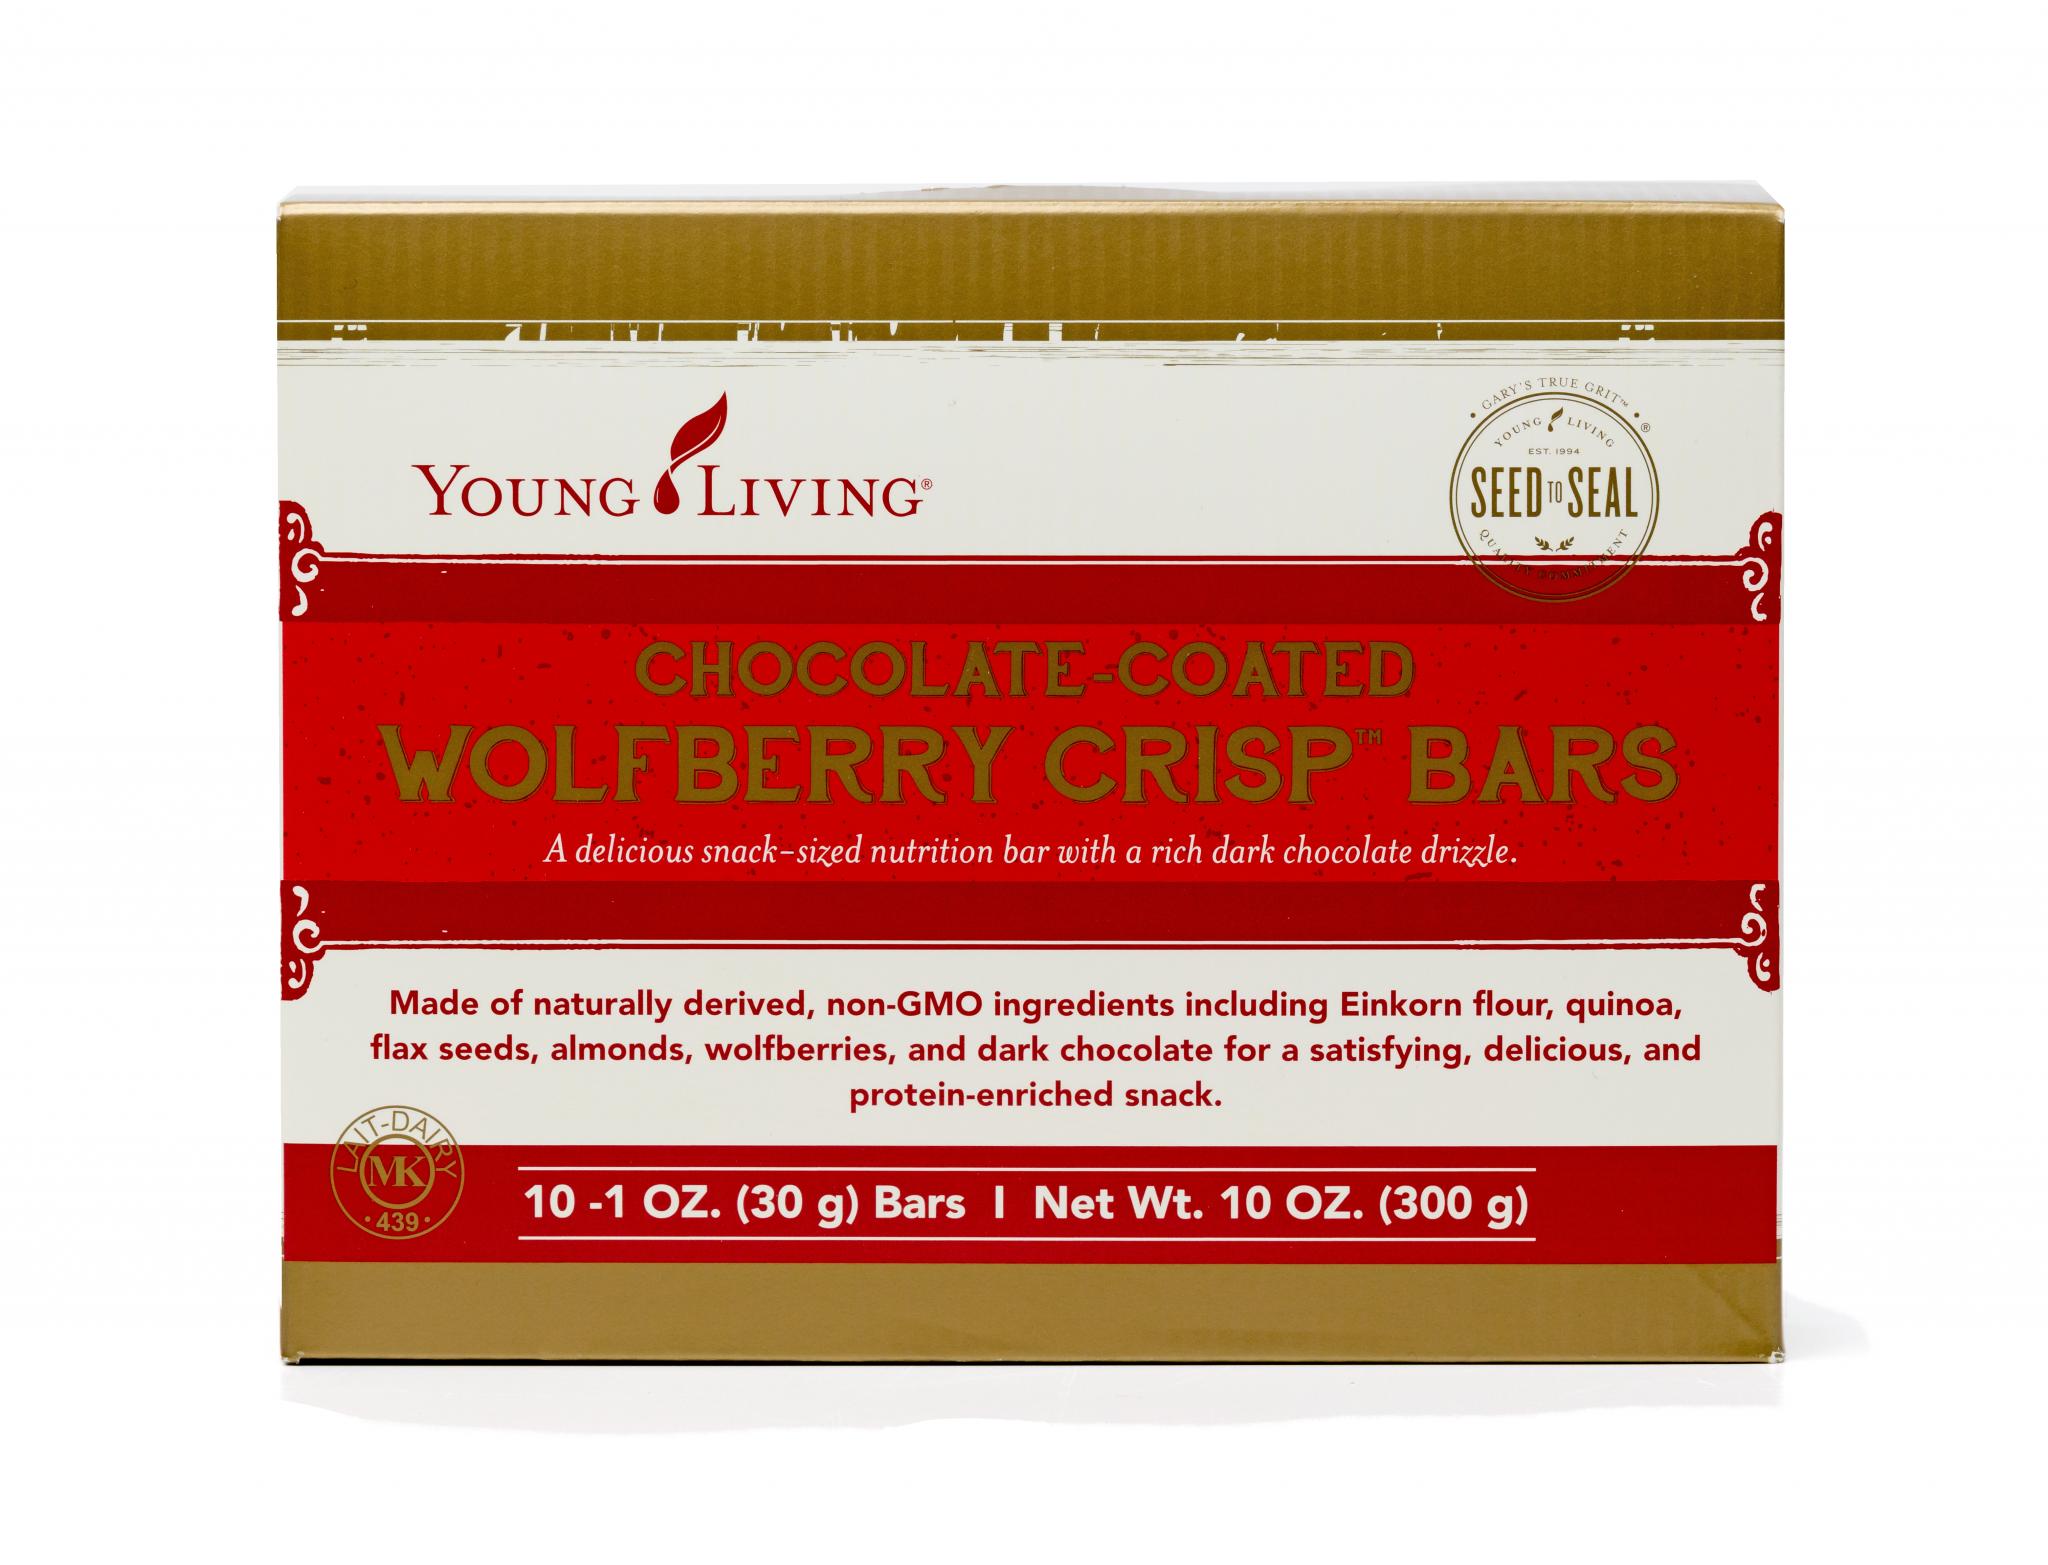 Wolfberry Crisp Bars